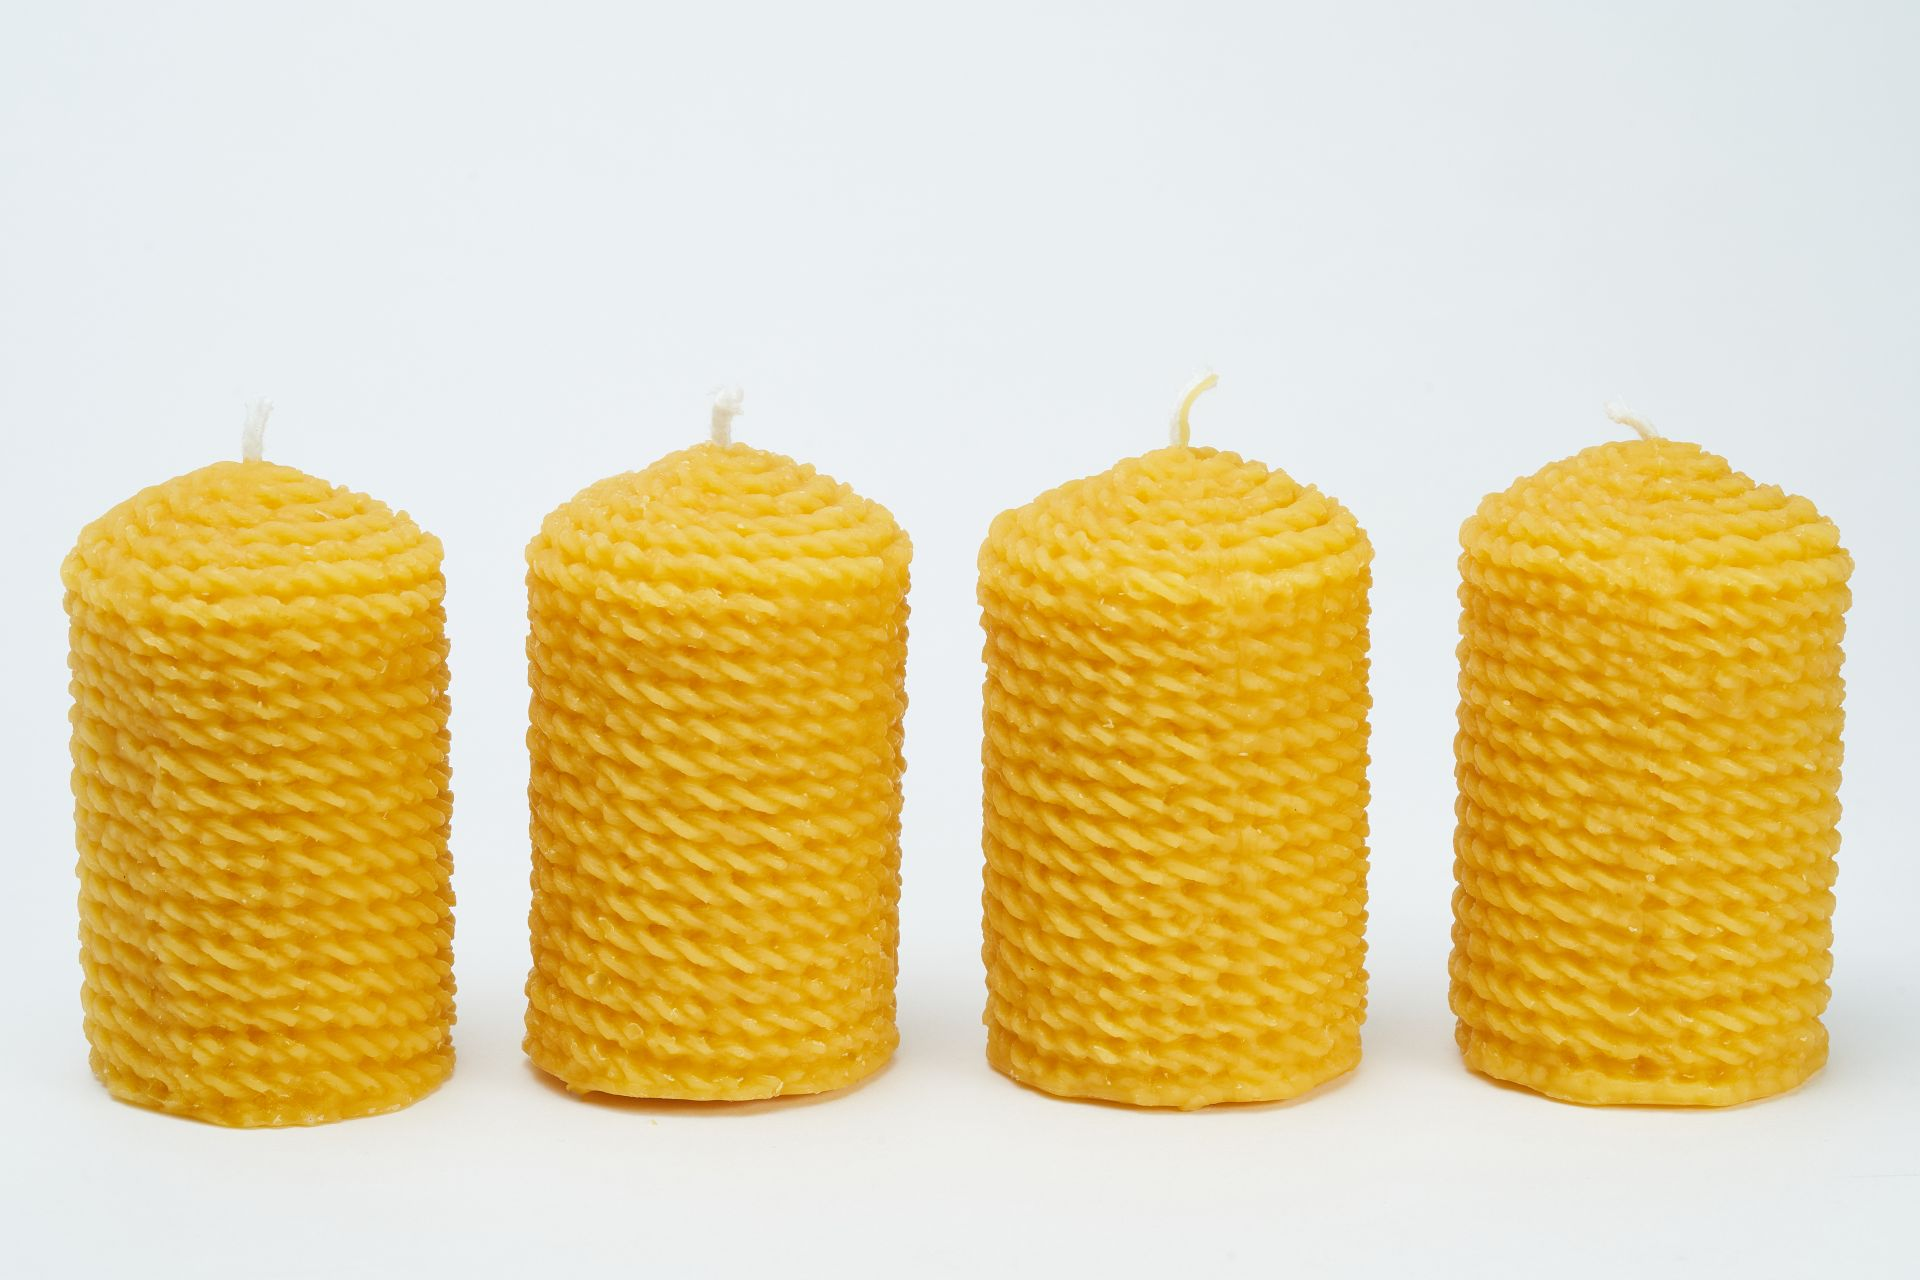 4x Kordelkerze (ca. 9,5cm x 5,5cm) aus 100% Bienenwachs vom Imker